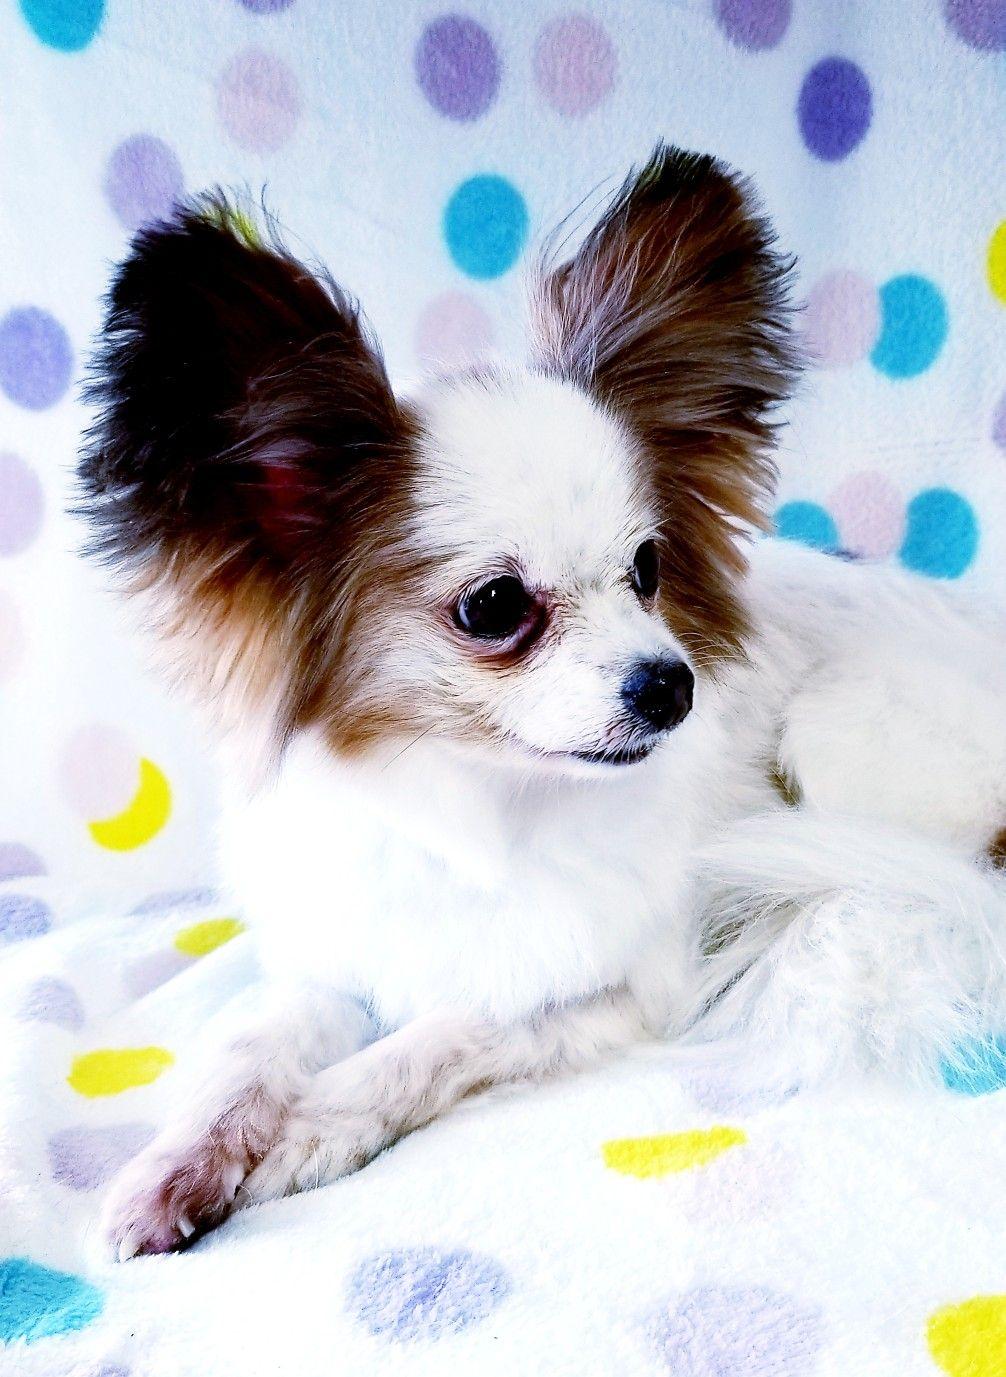 Pin by Carmen Hudson Troyer on Pet Grooming by Carmen